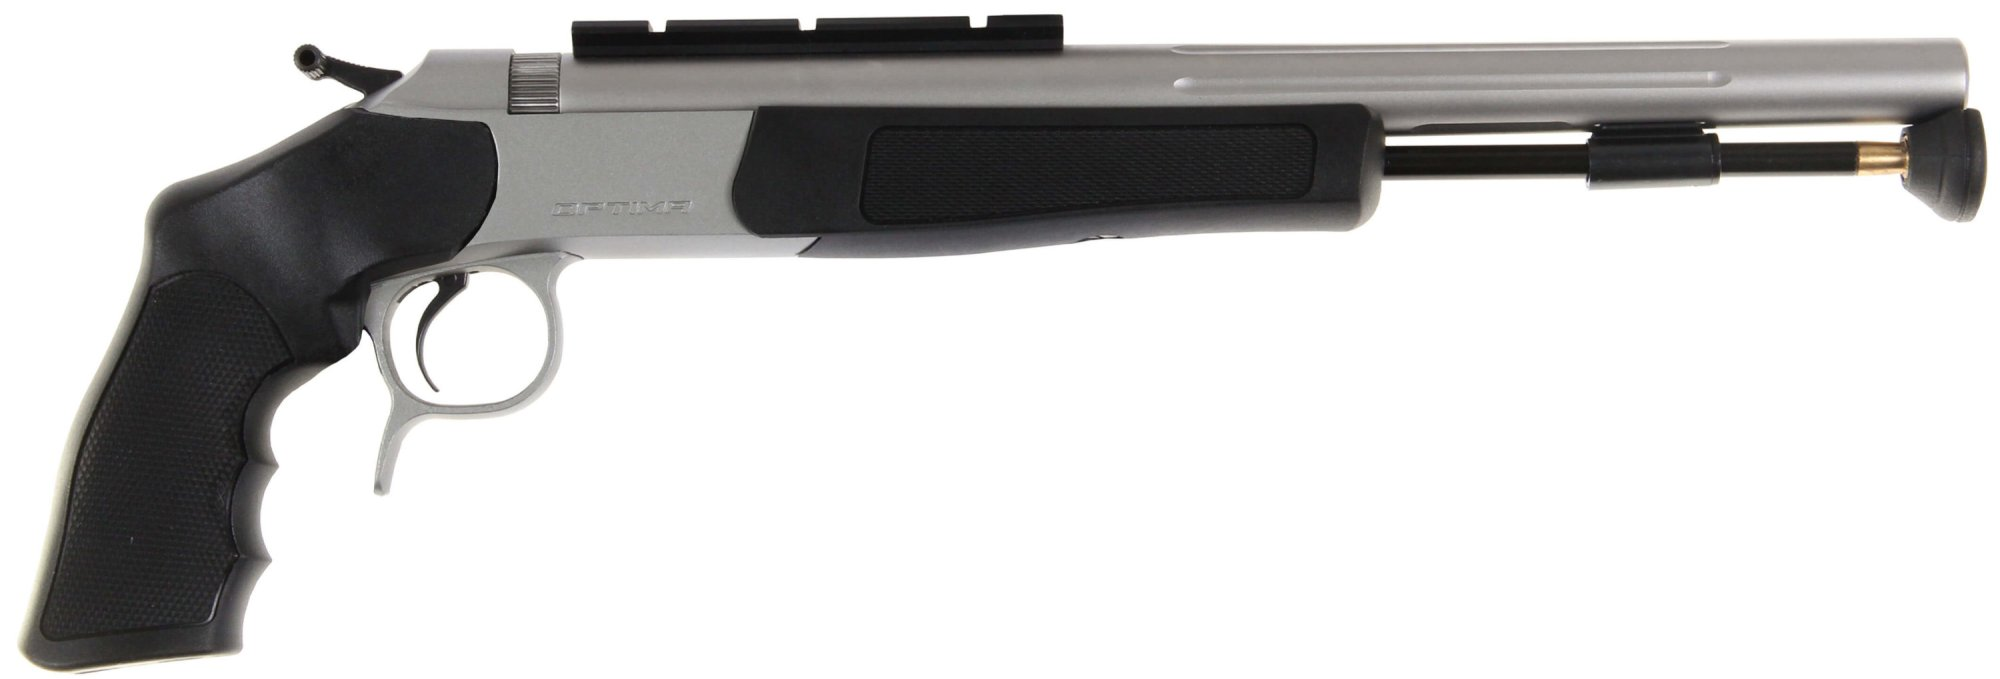 hight resolution of optima v2 pistol stainless steel with black stocks